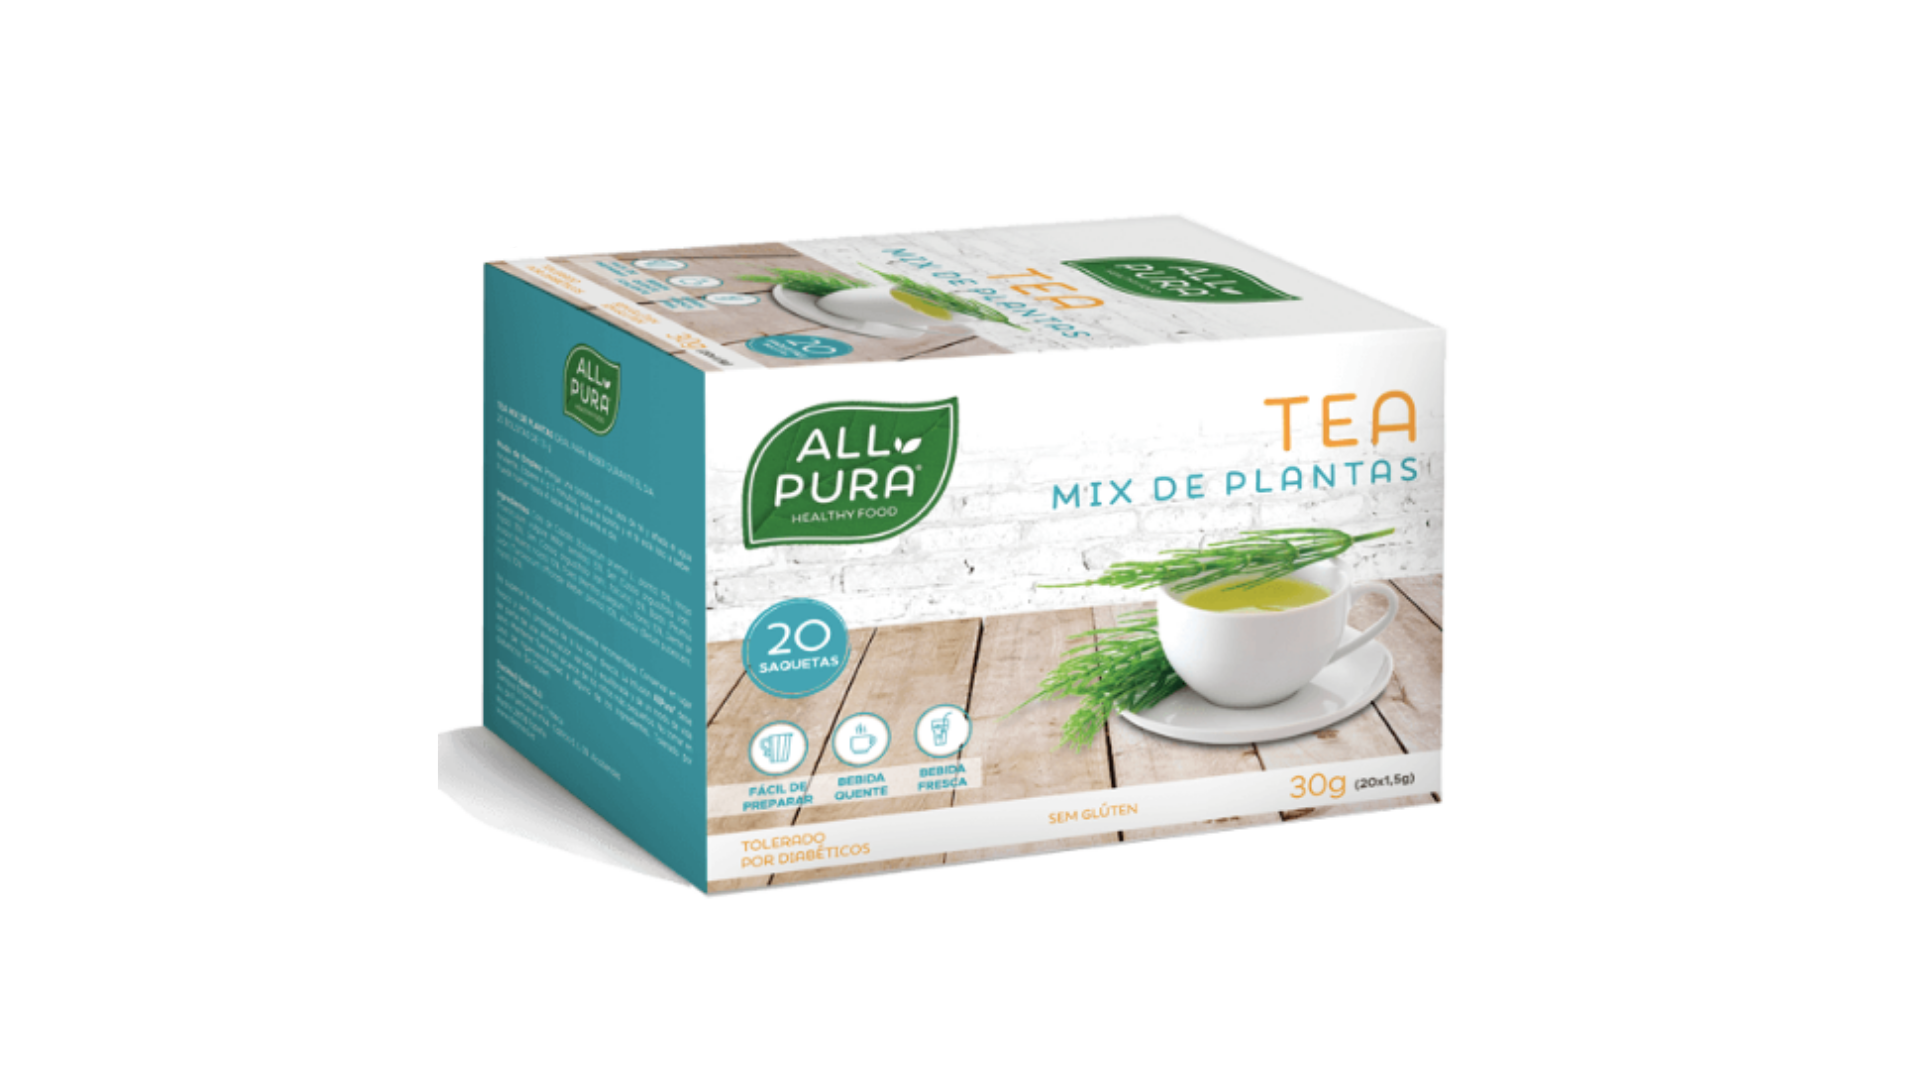 ALLPURA | Tea Mix Plantas 20 saquetas